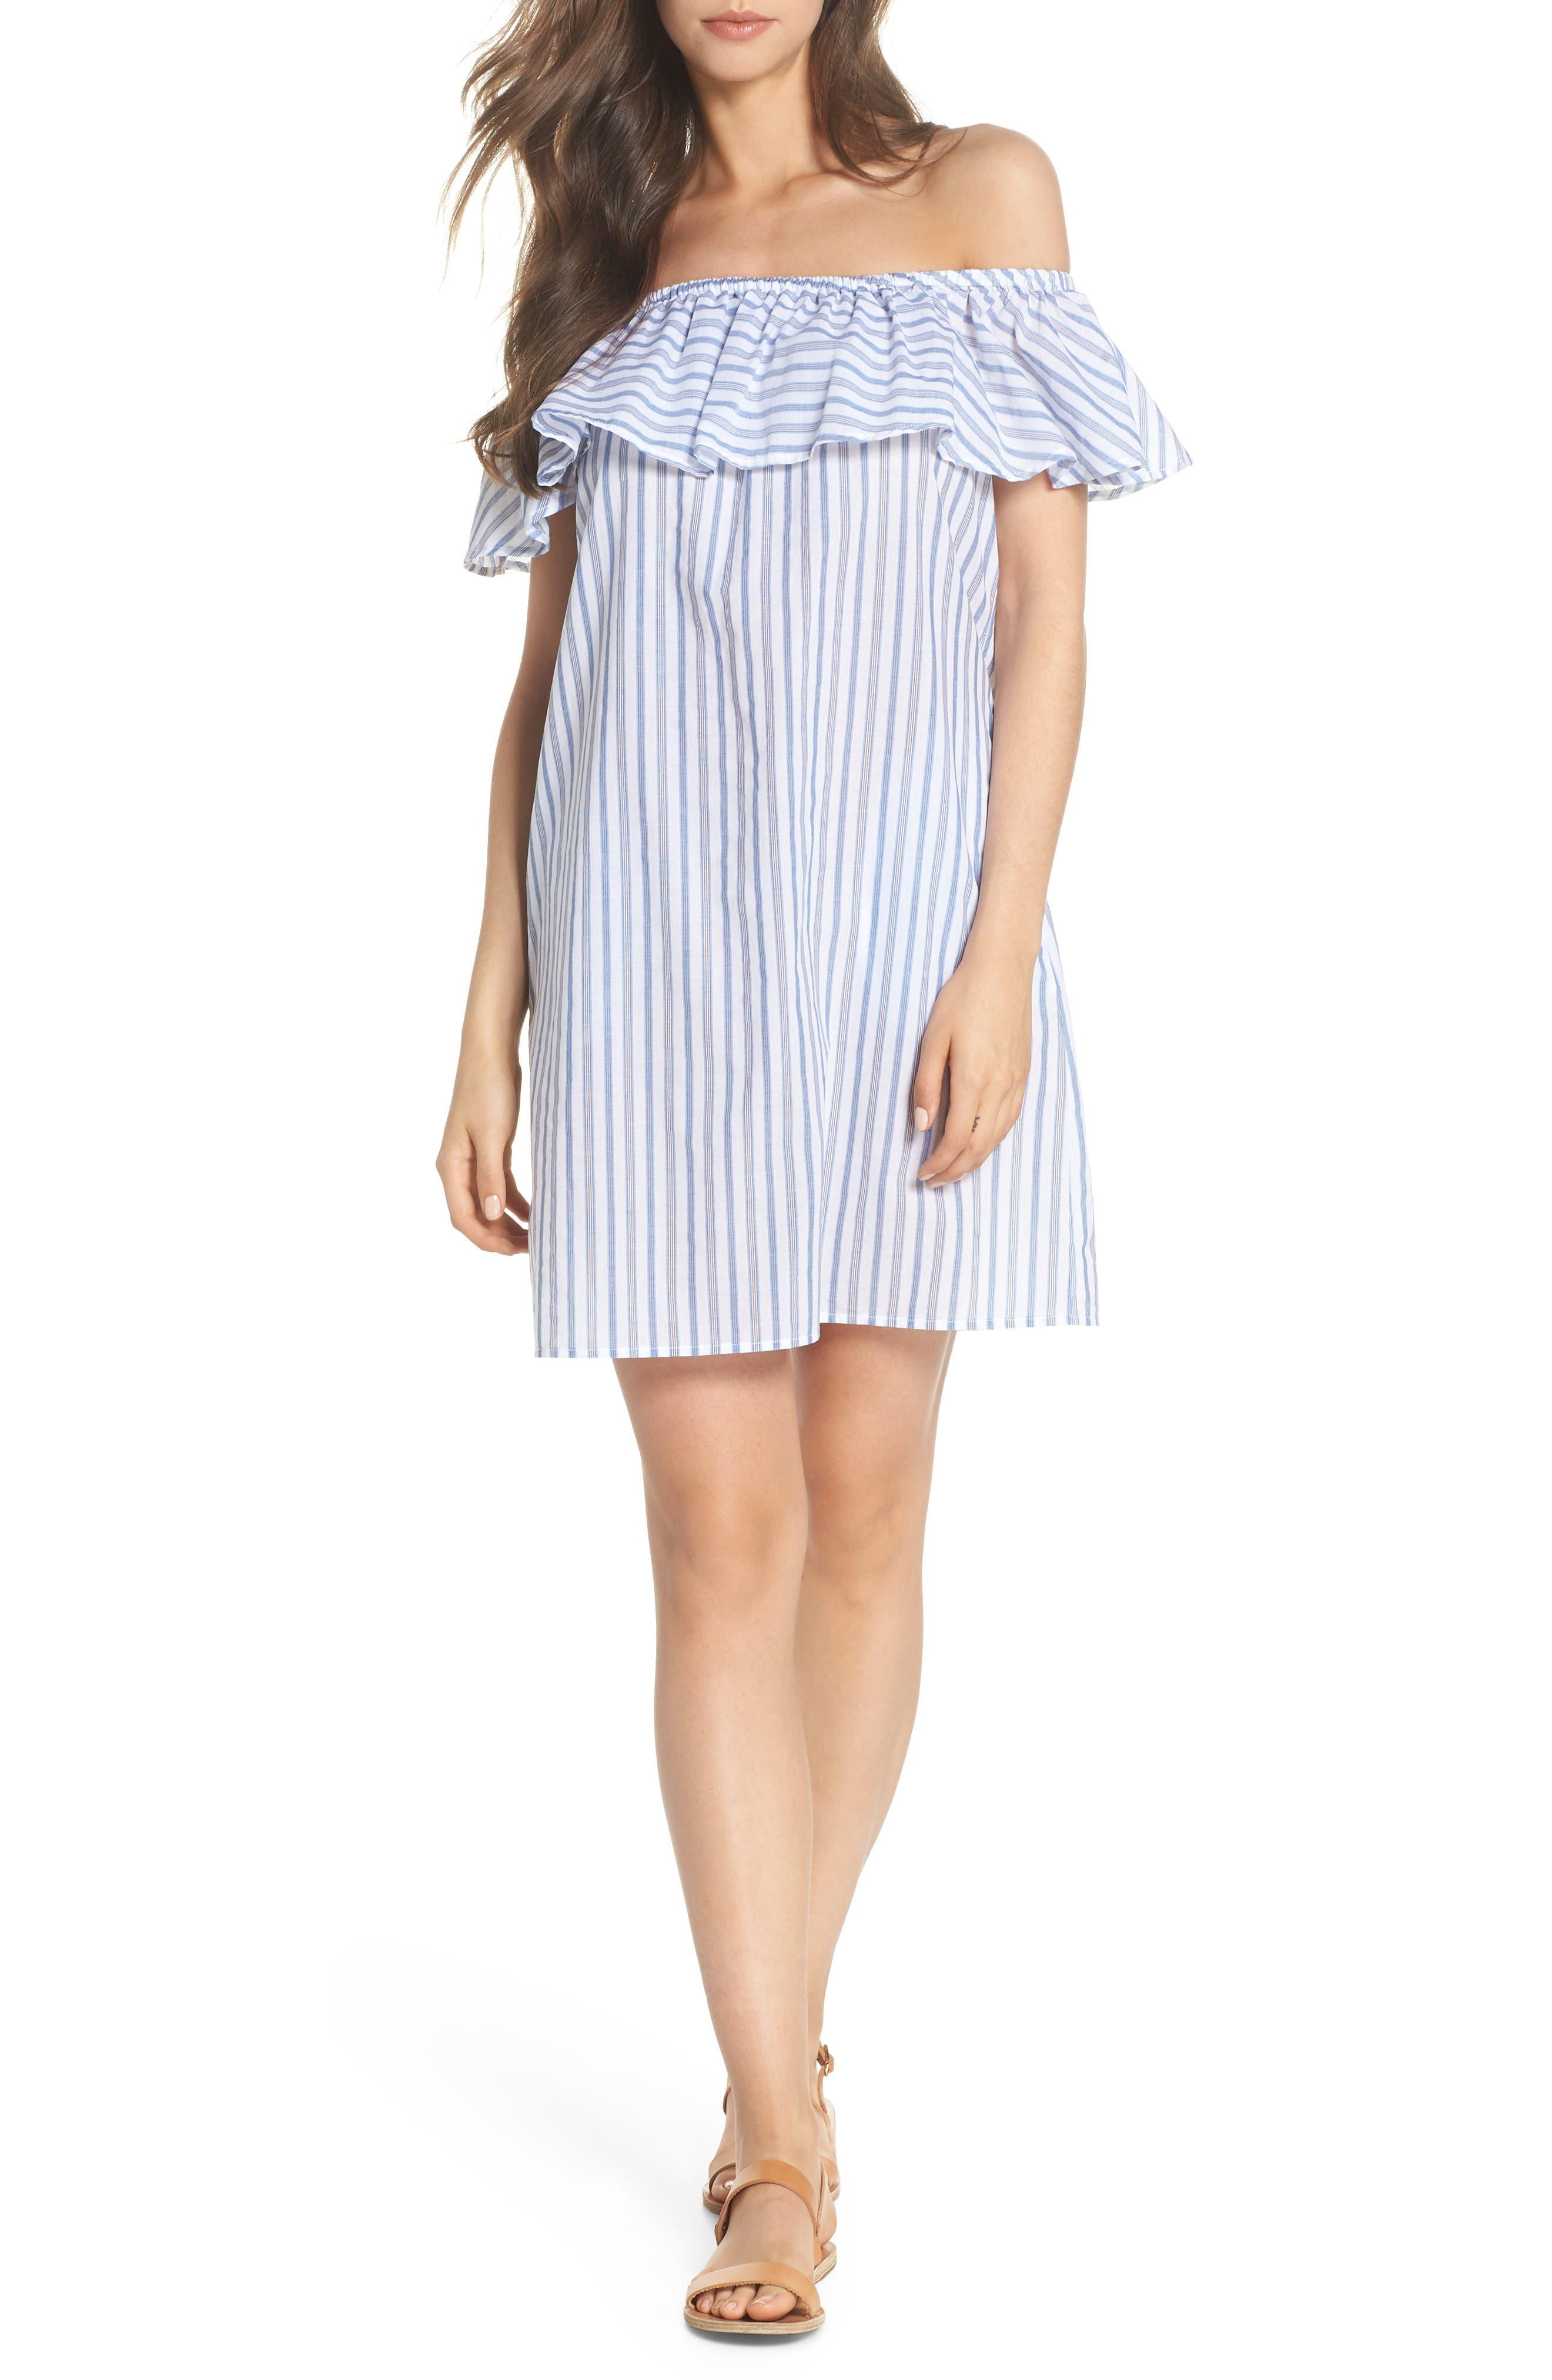 Ticking Stripe Off the Shoulder Cover-Up Dress,                         Main,                         color, 100